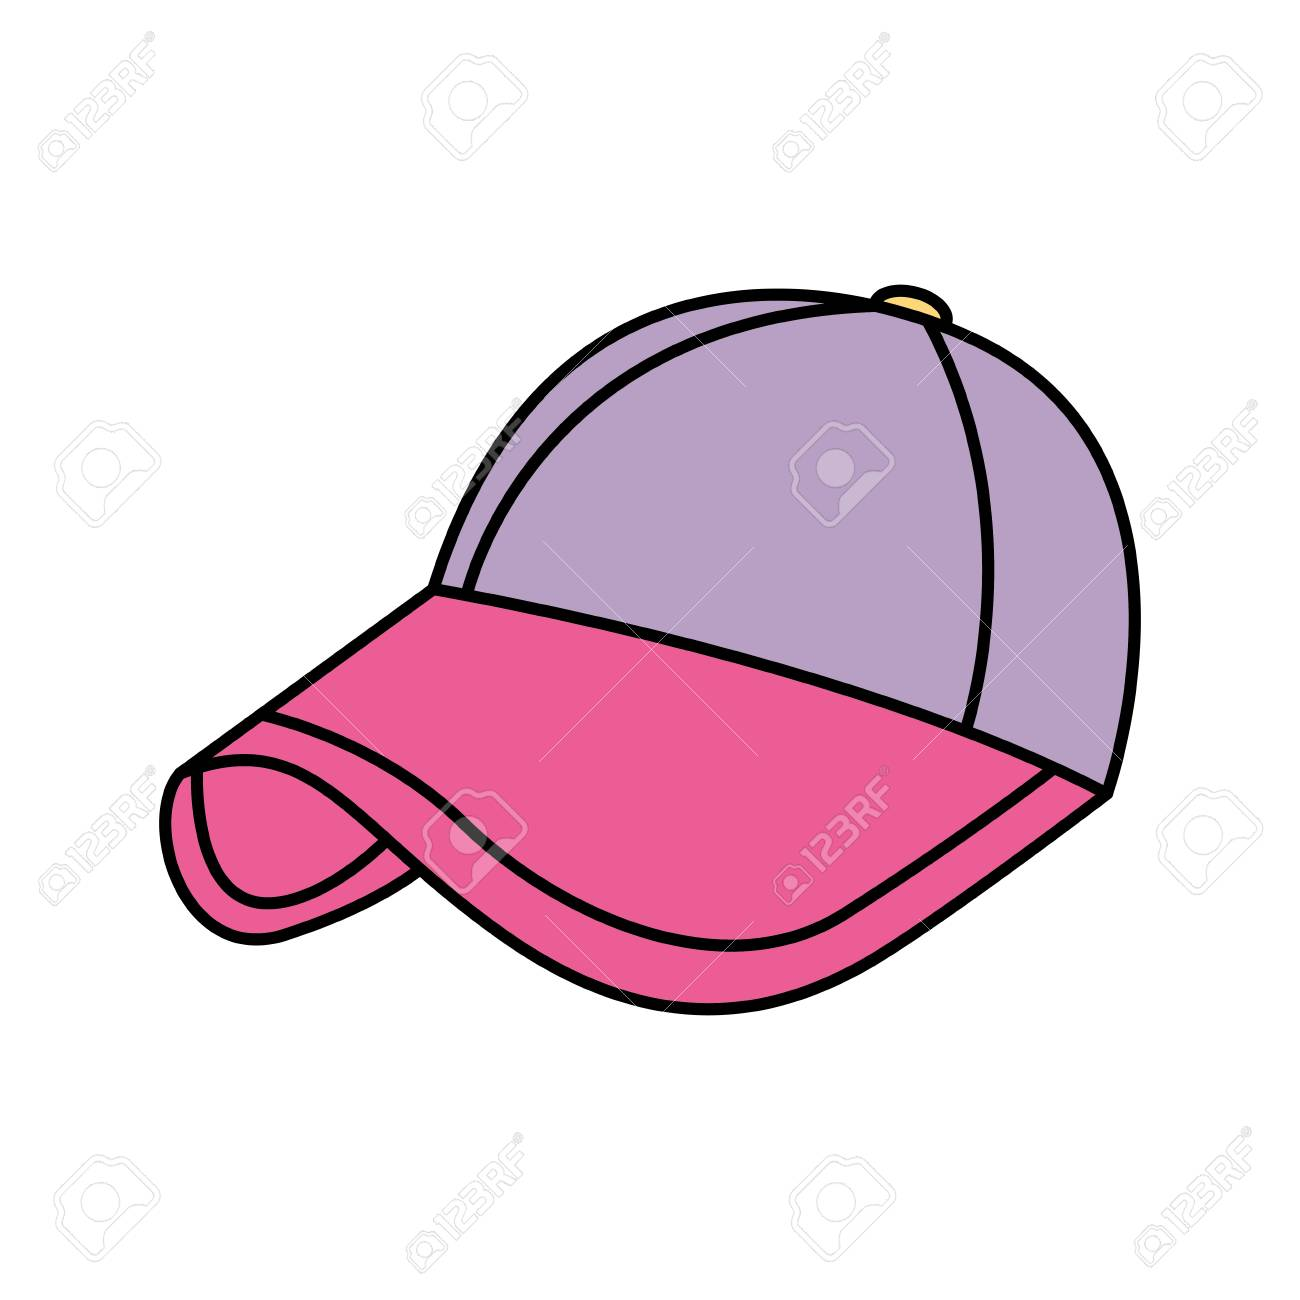 pink baseball cap clipart